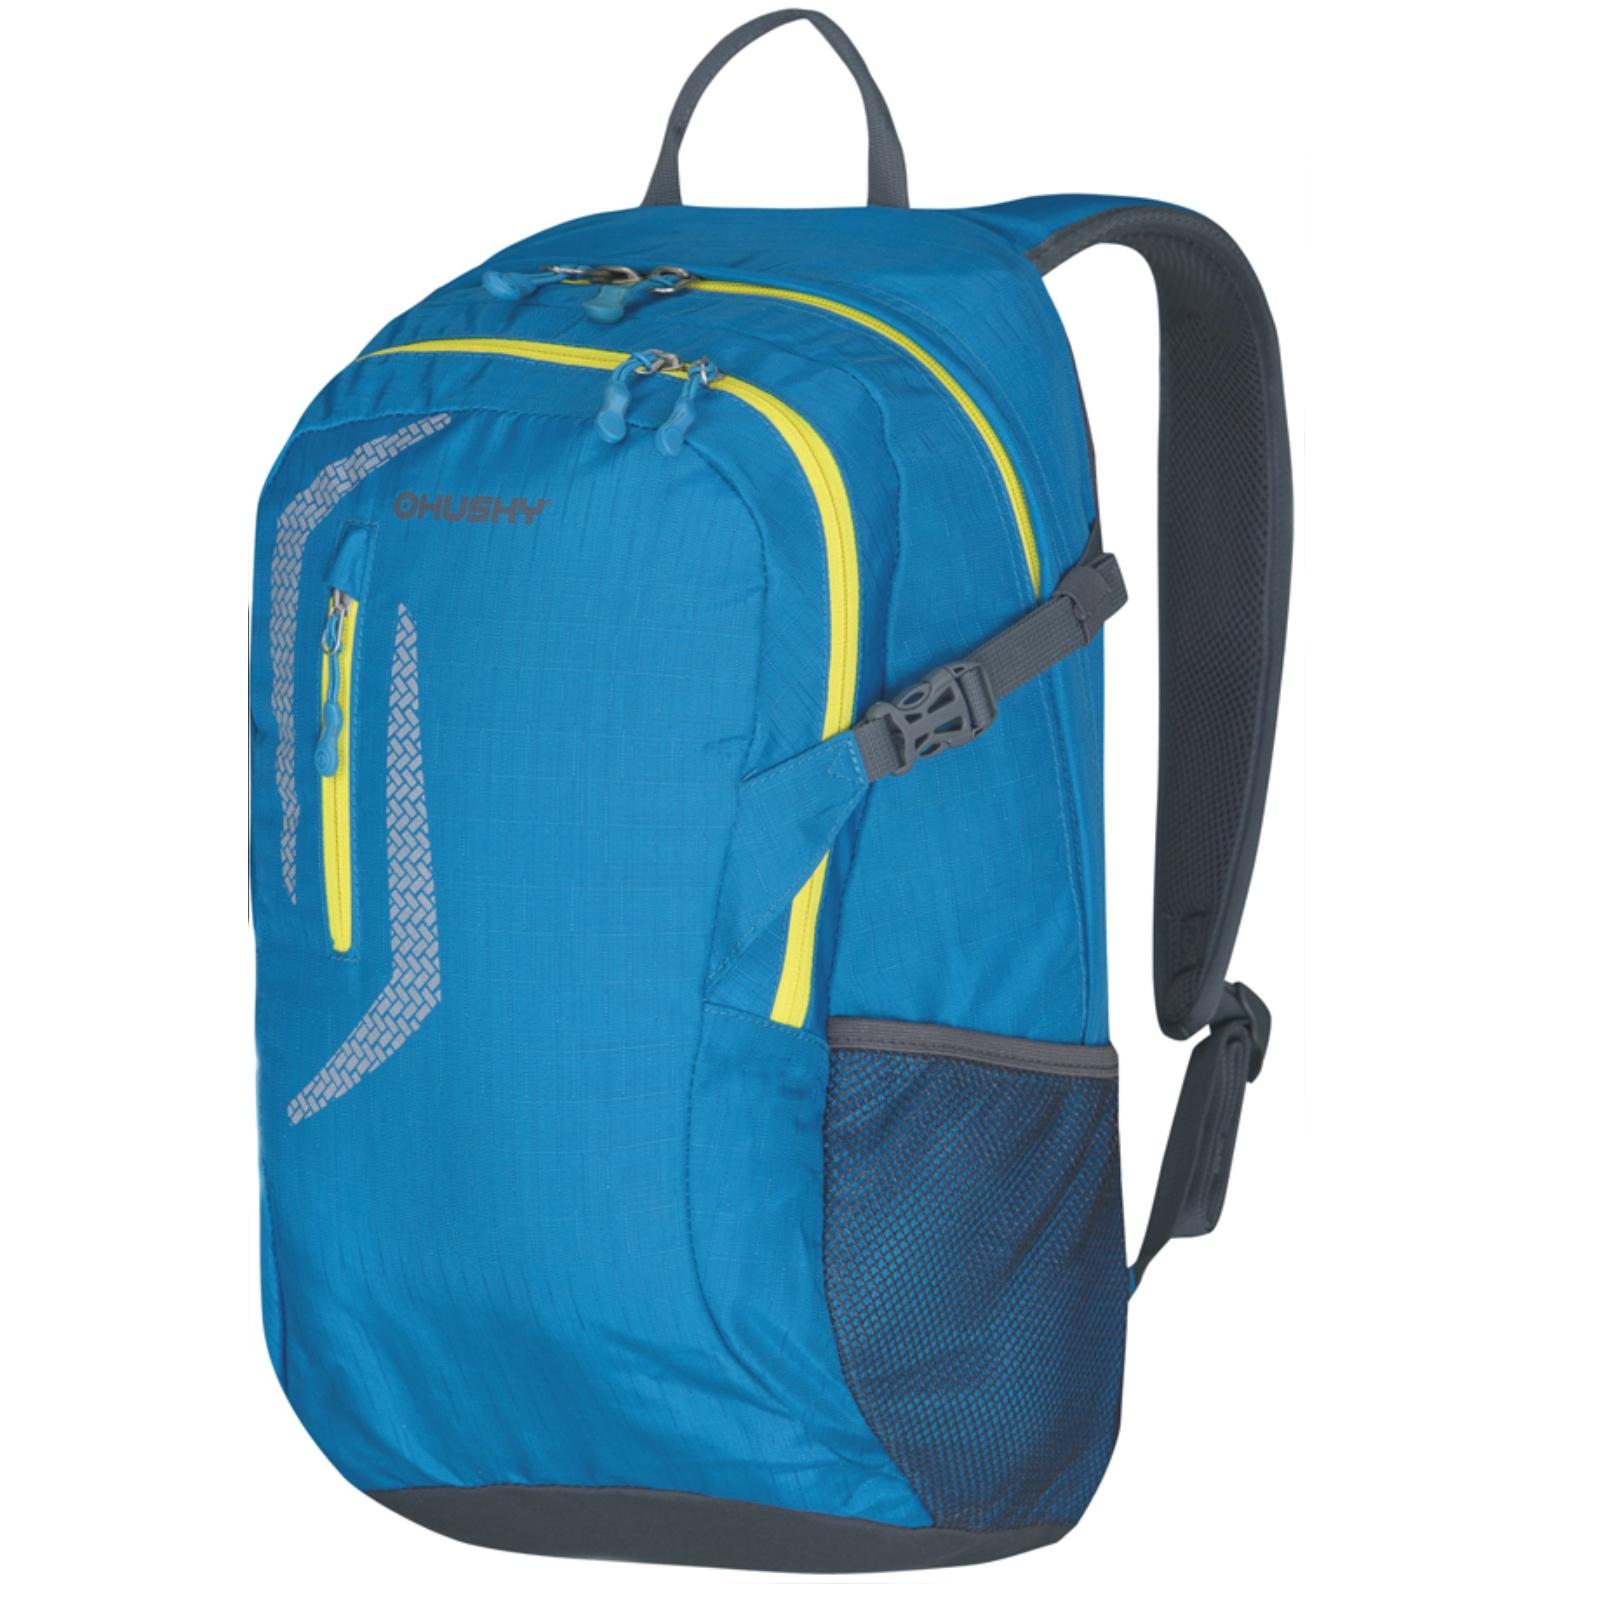 Batoh HUSKY Malin 25l - modrý